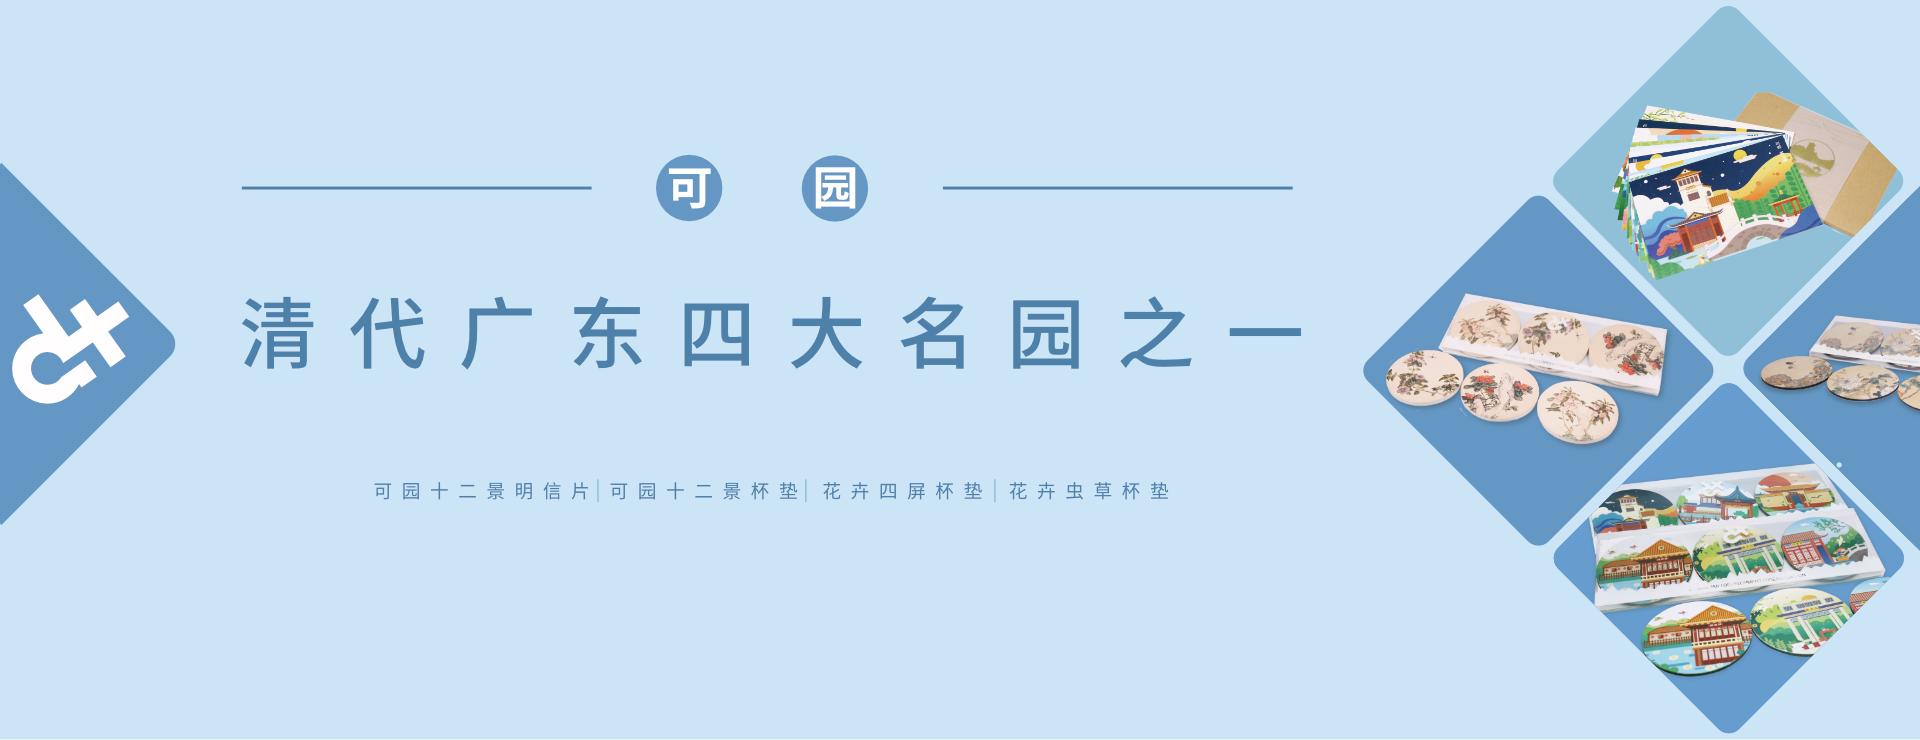 东莞市品牌创新中心-栏目banner